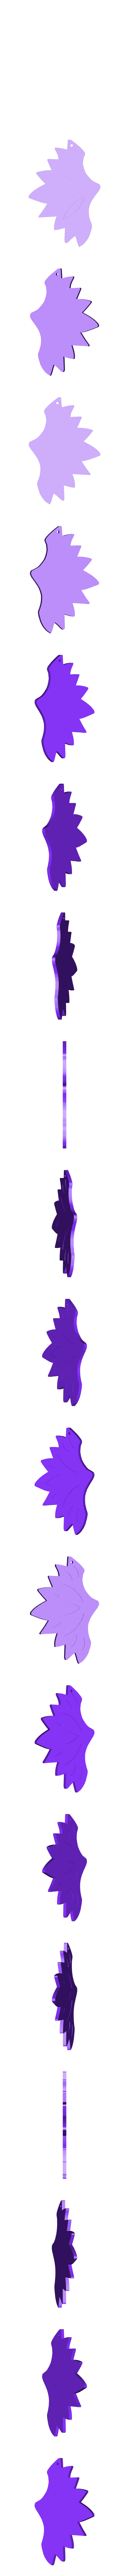 Boucle papillon1 V2 L.stl Download free STL file Butterfly Earrings • 3D print model, SamiJoe